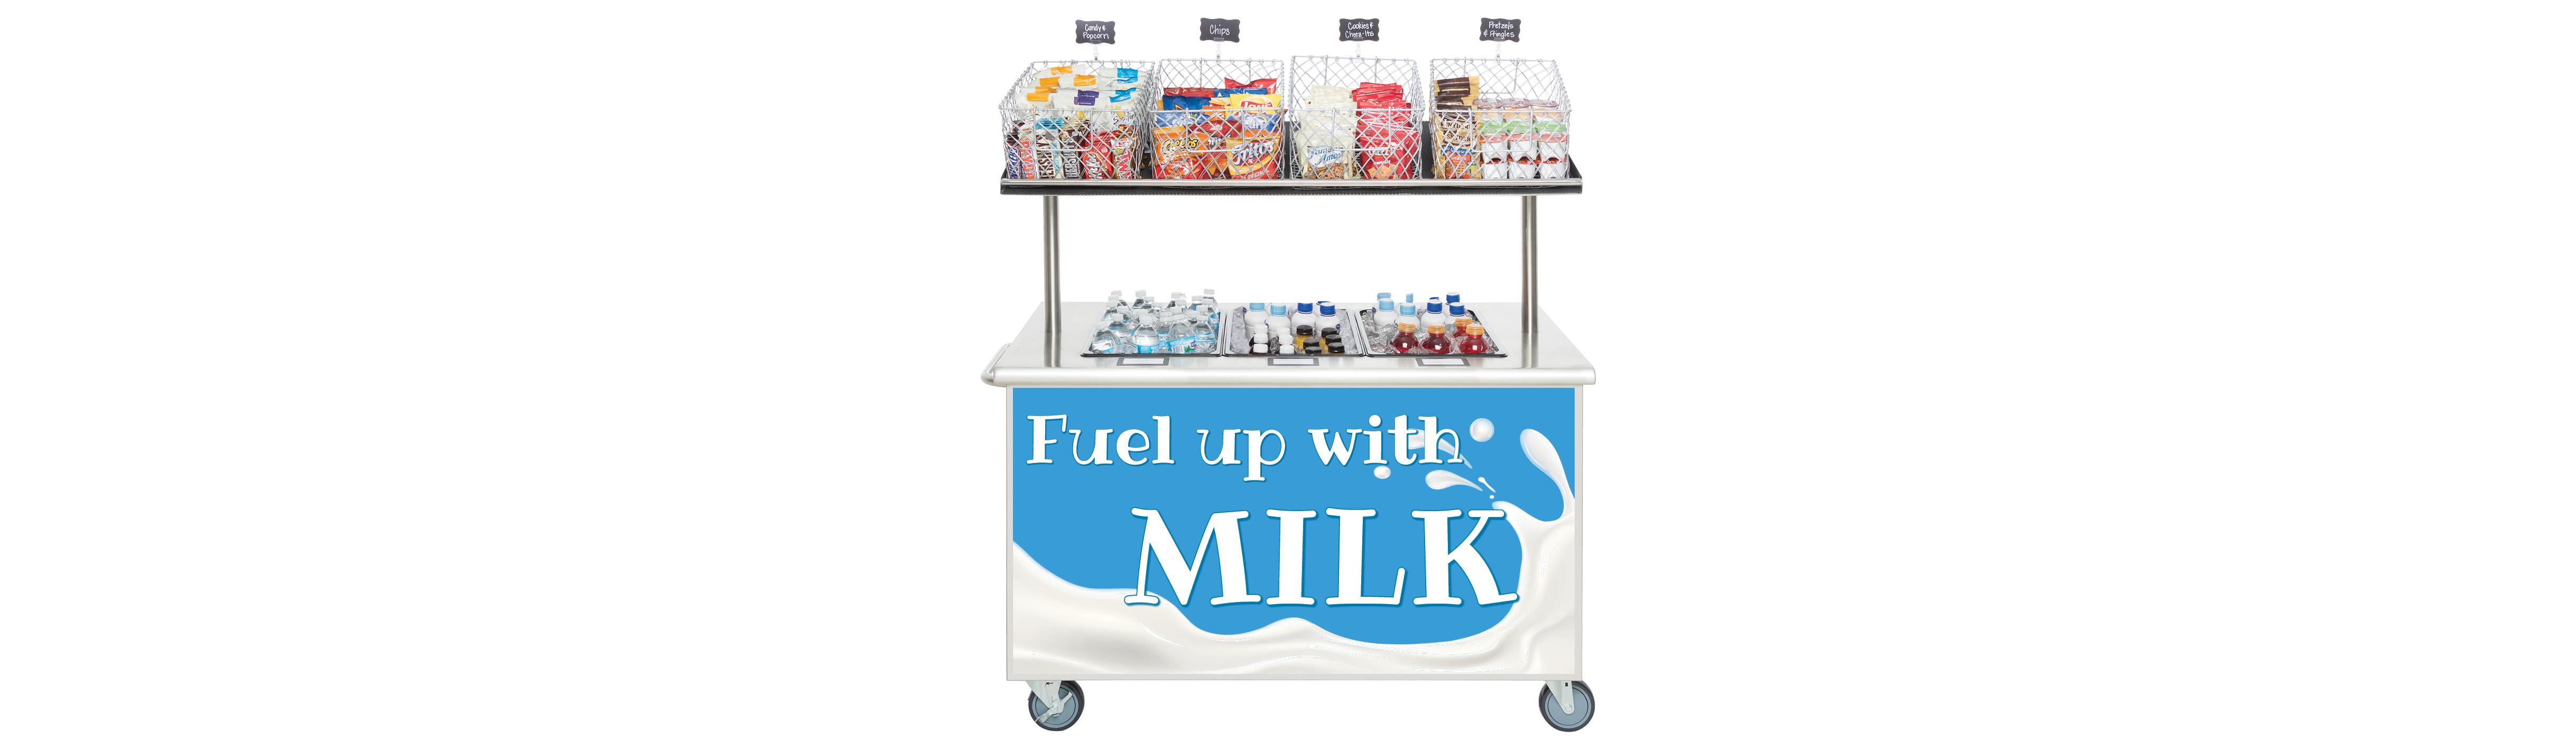 Fuel Up with Milk